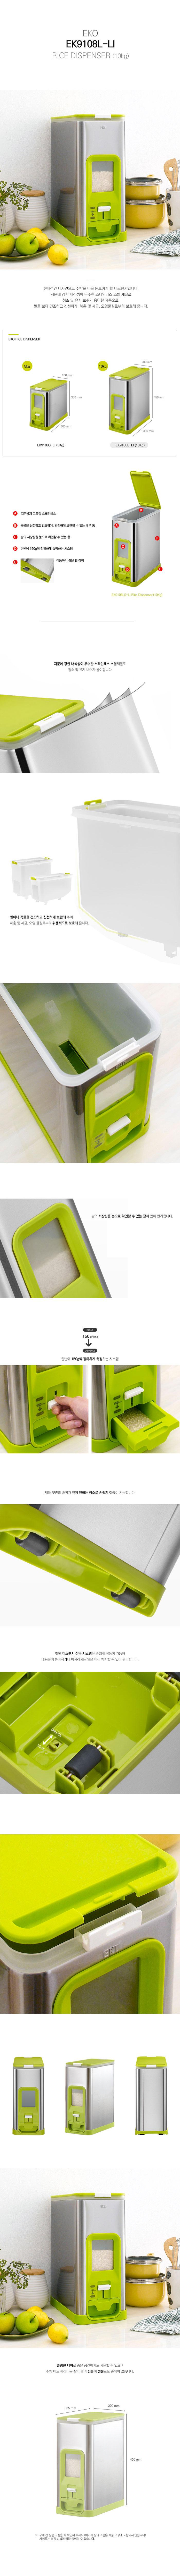 EK9108L-LI-Rice-Dispenser_180330.jpg